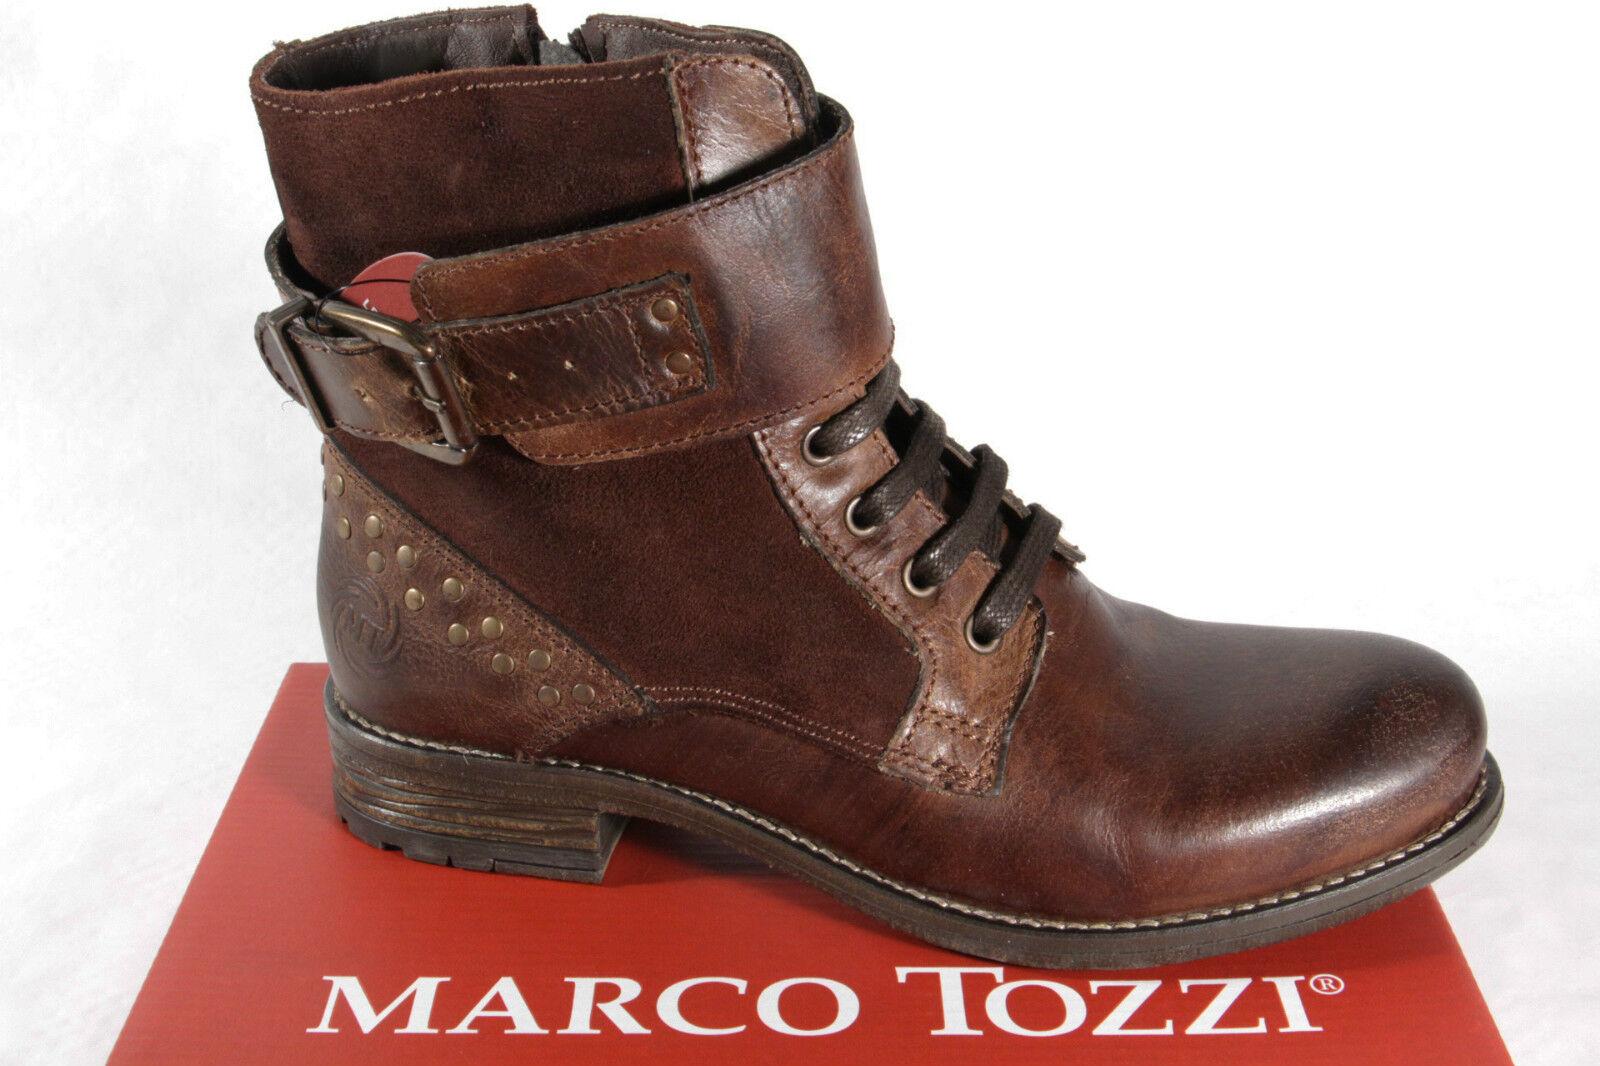 Marco Tozzi señora botas botines ata, Boots, RV, marrón! nuevo!